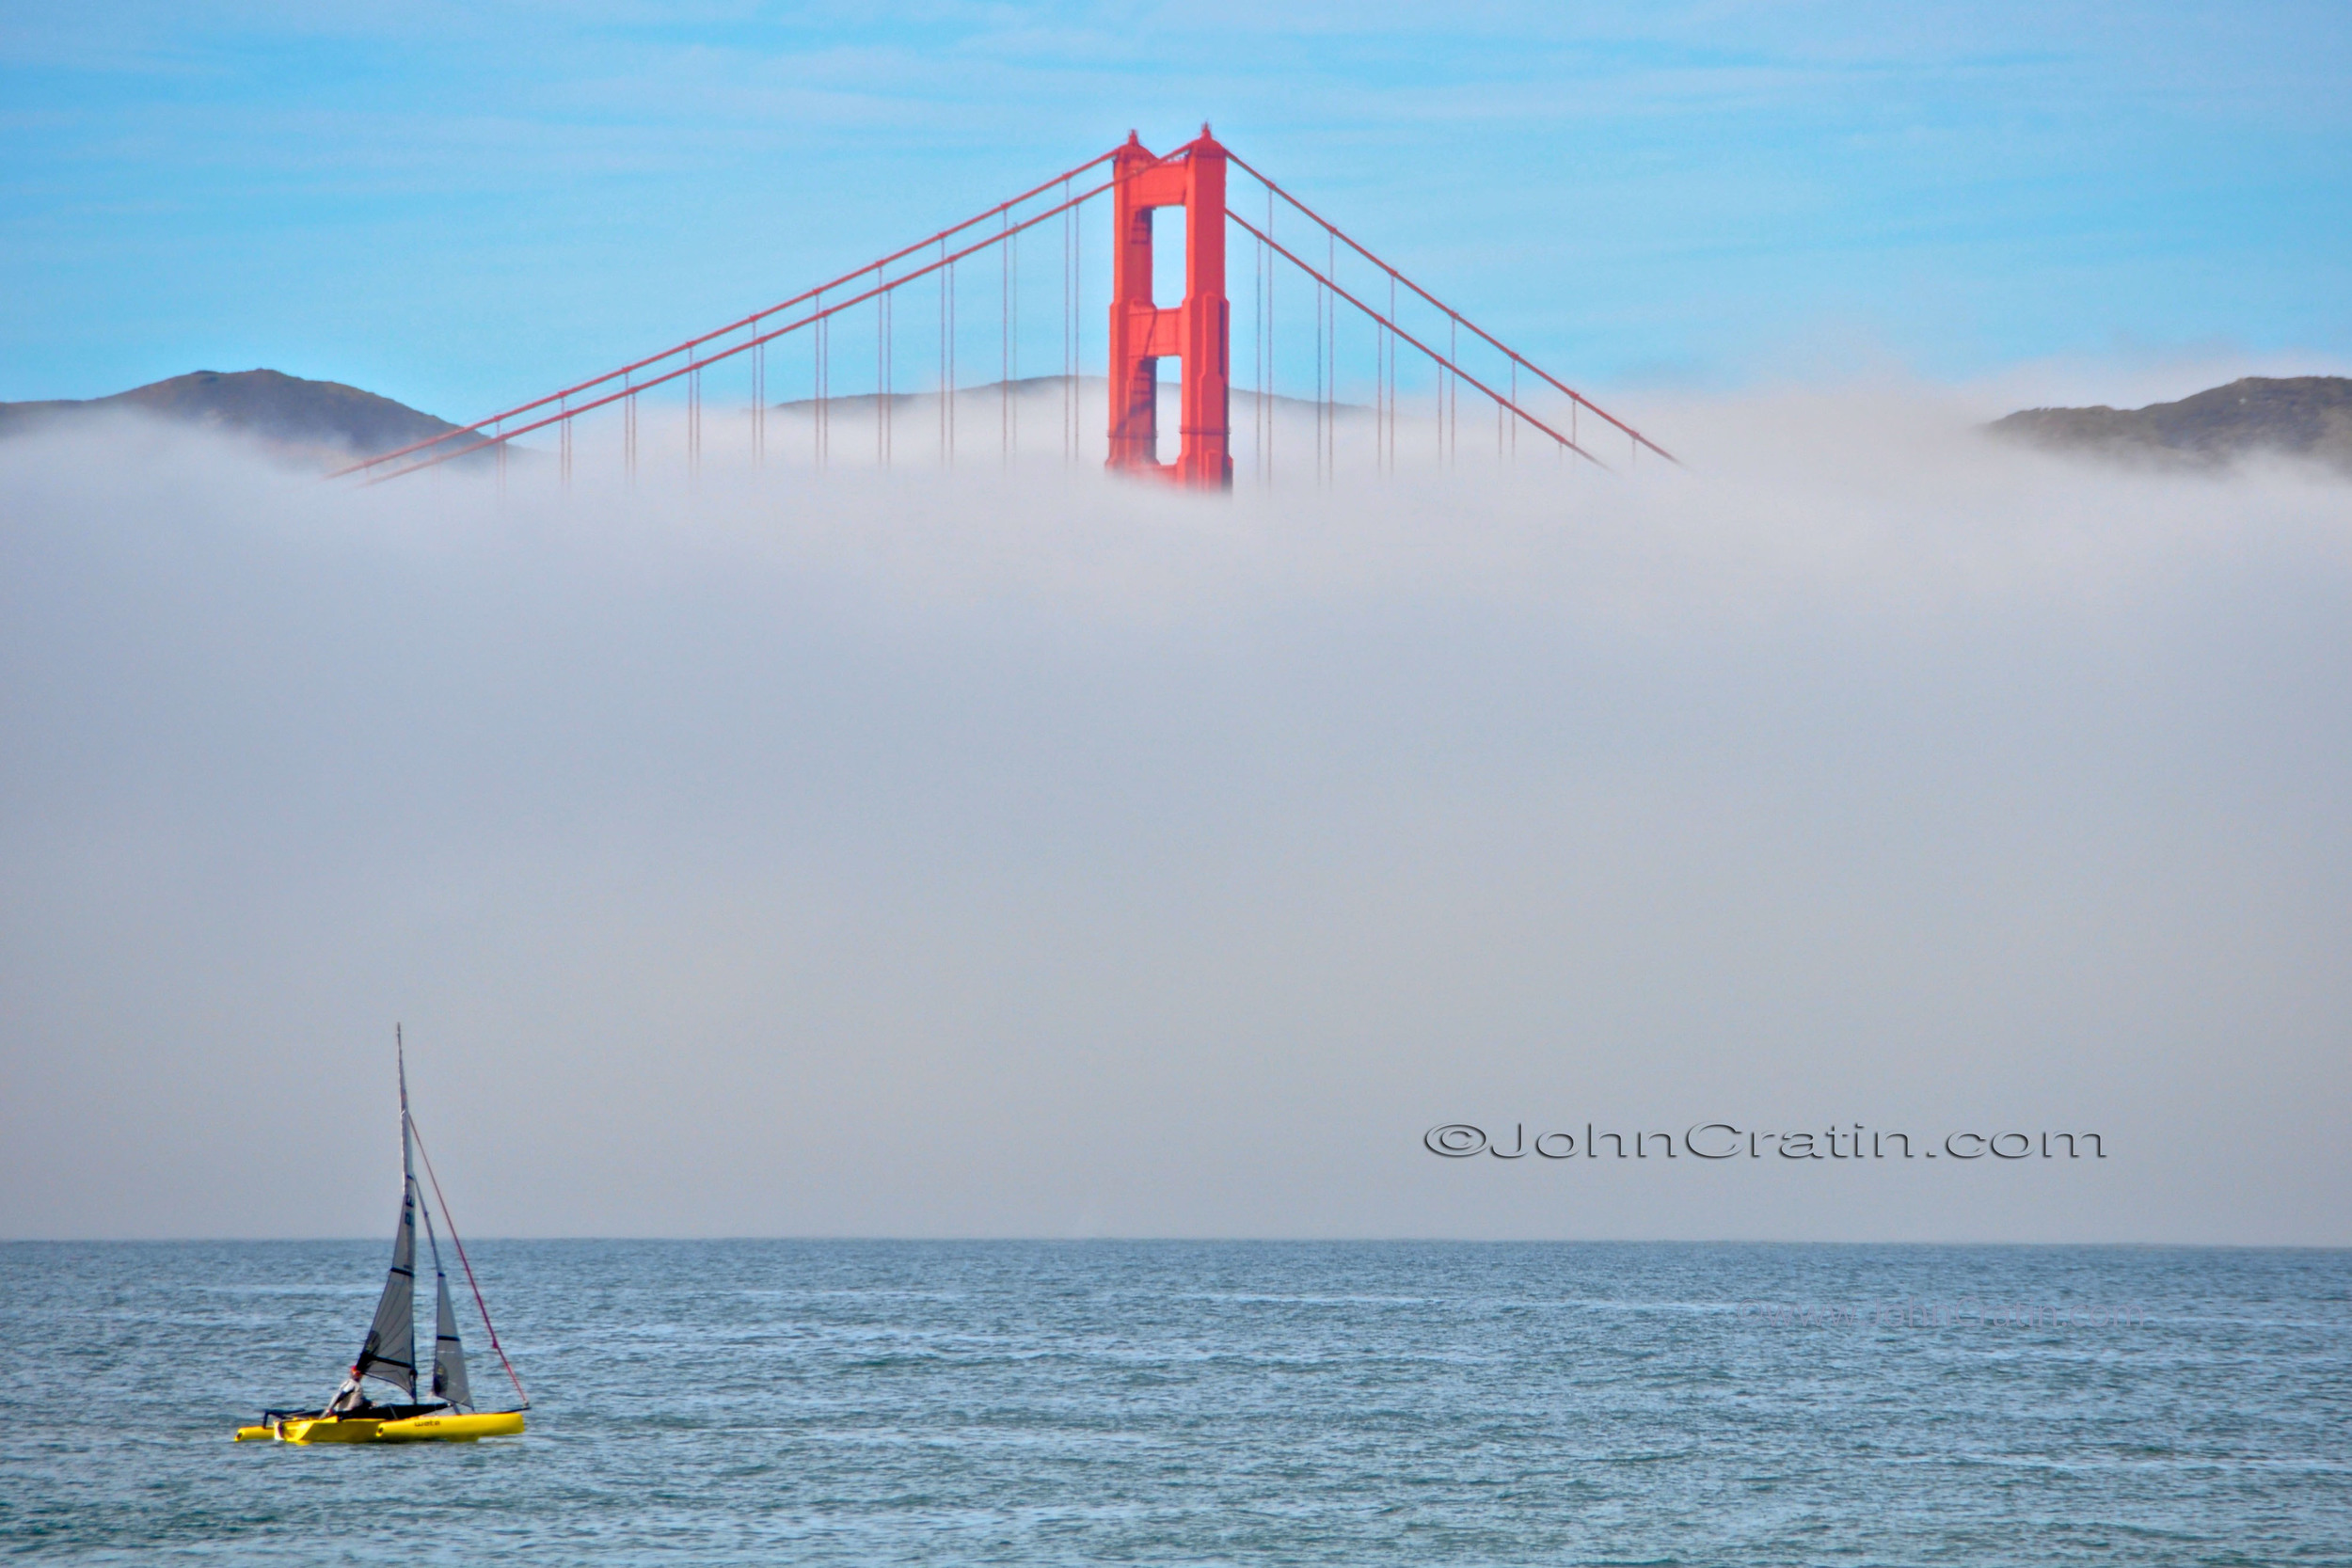 Golden Gate Cat C-R copy.jpg